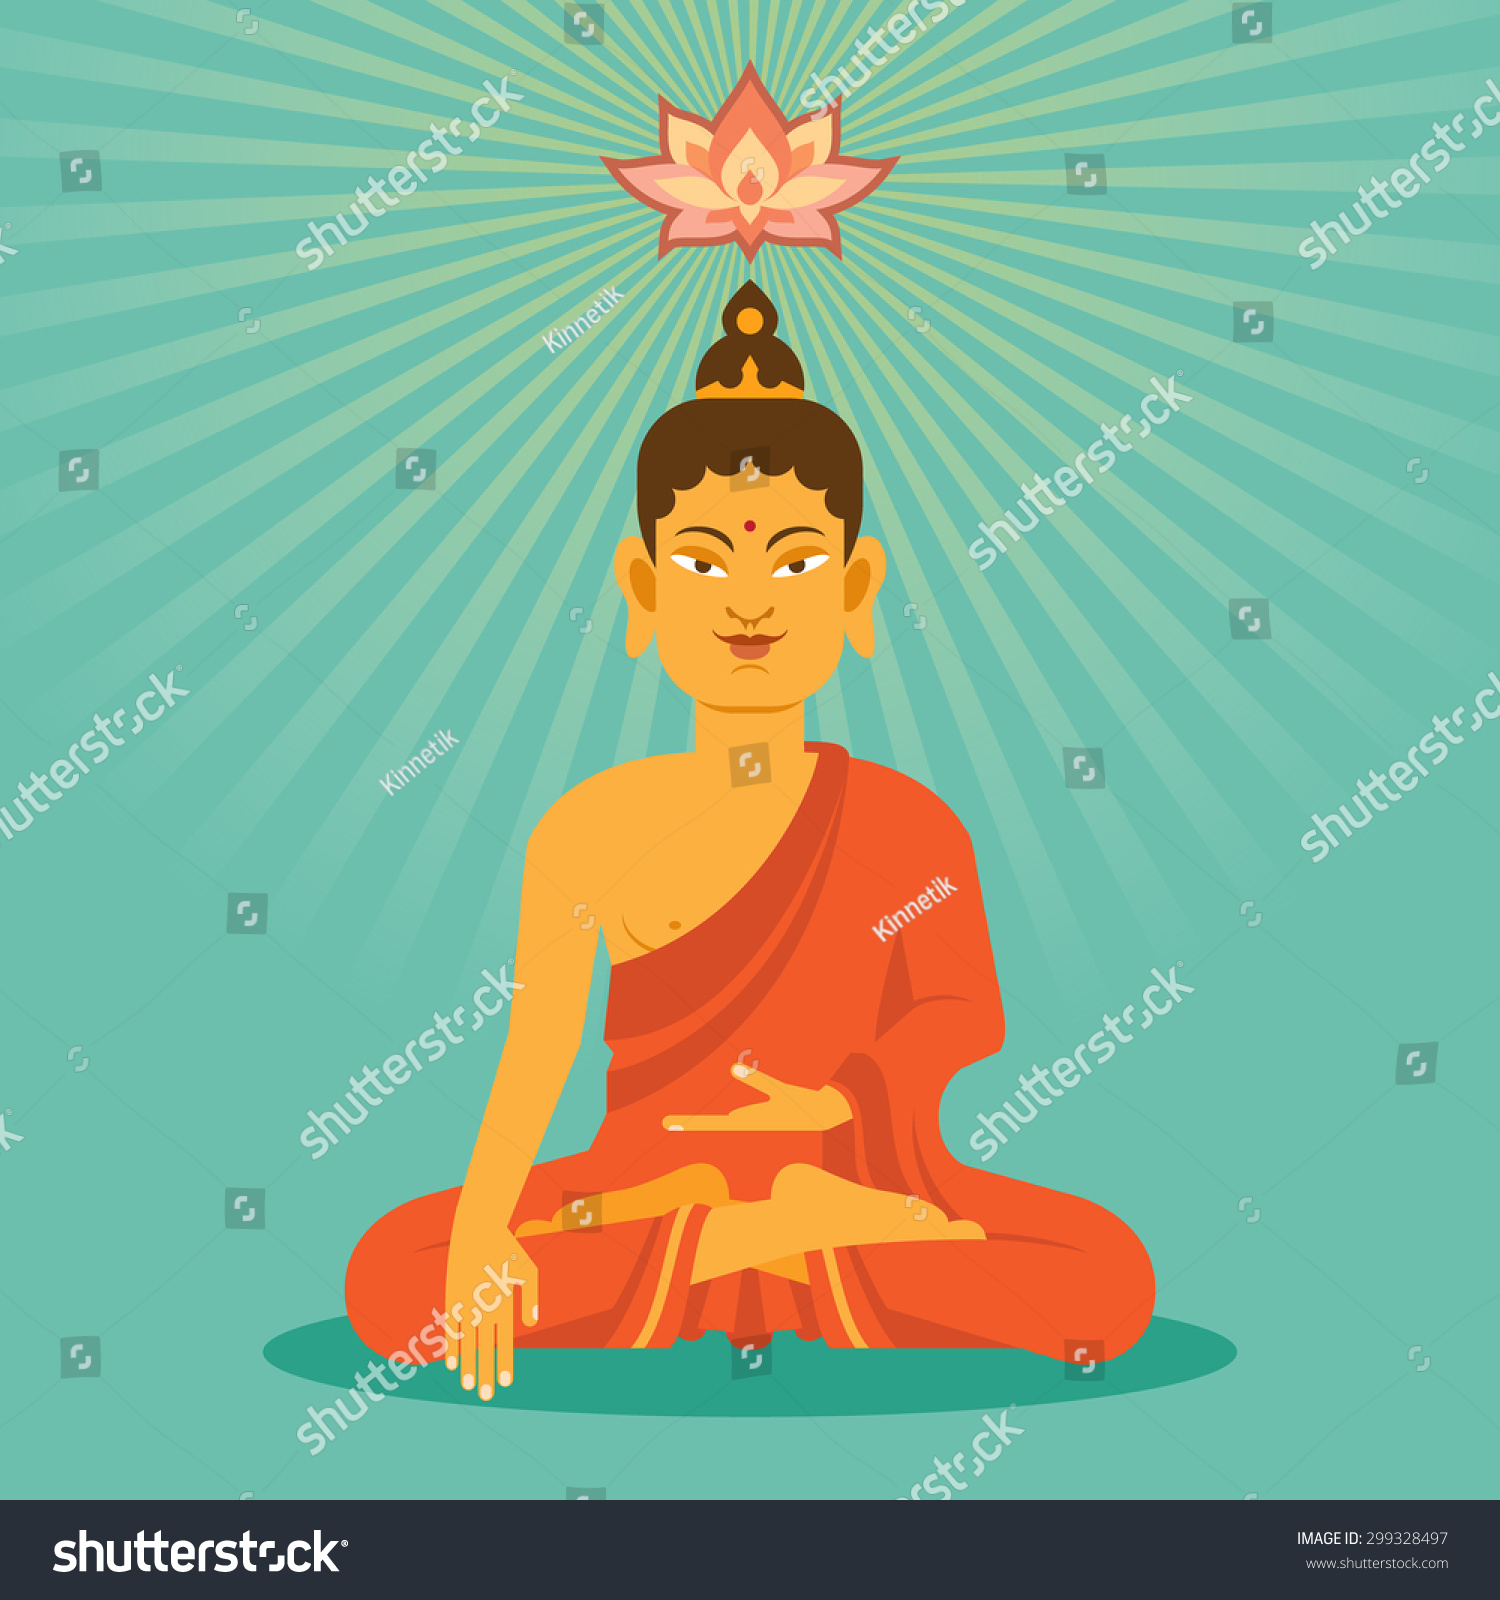 Sitting Meditation Buddha Lotus Flower Flat Stock Vector 299328497